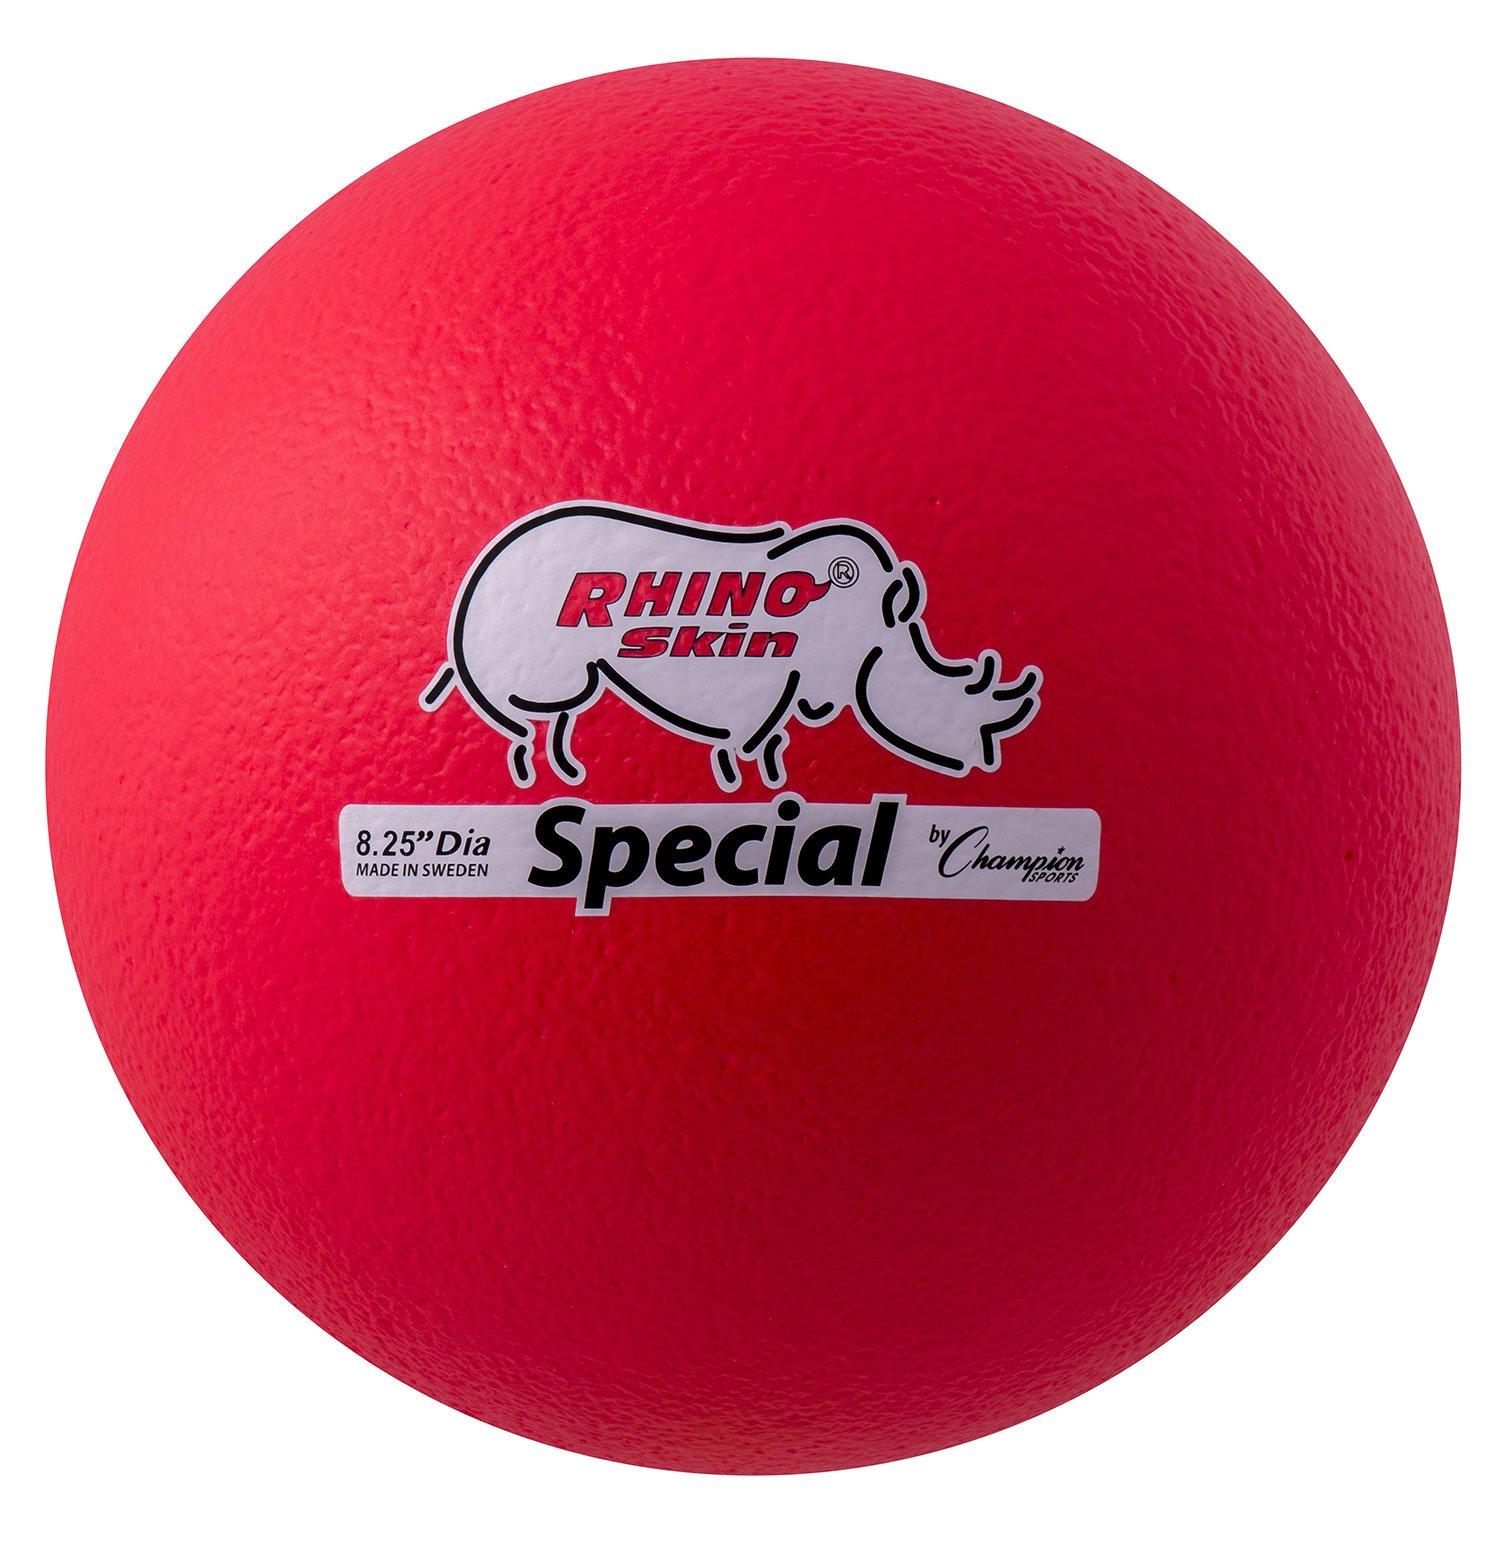 Champion Sports Rhino Skin Special Ball (Neon Red)